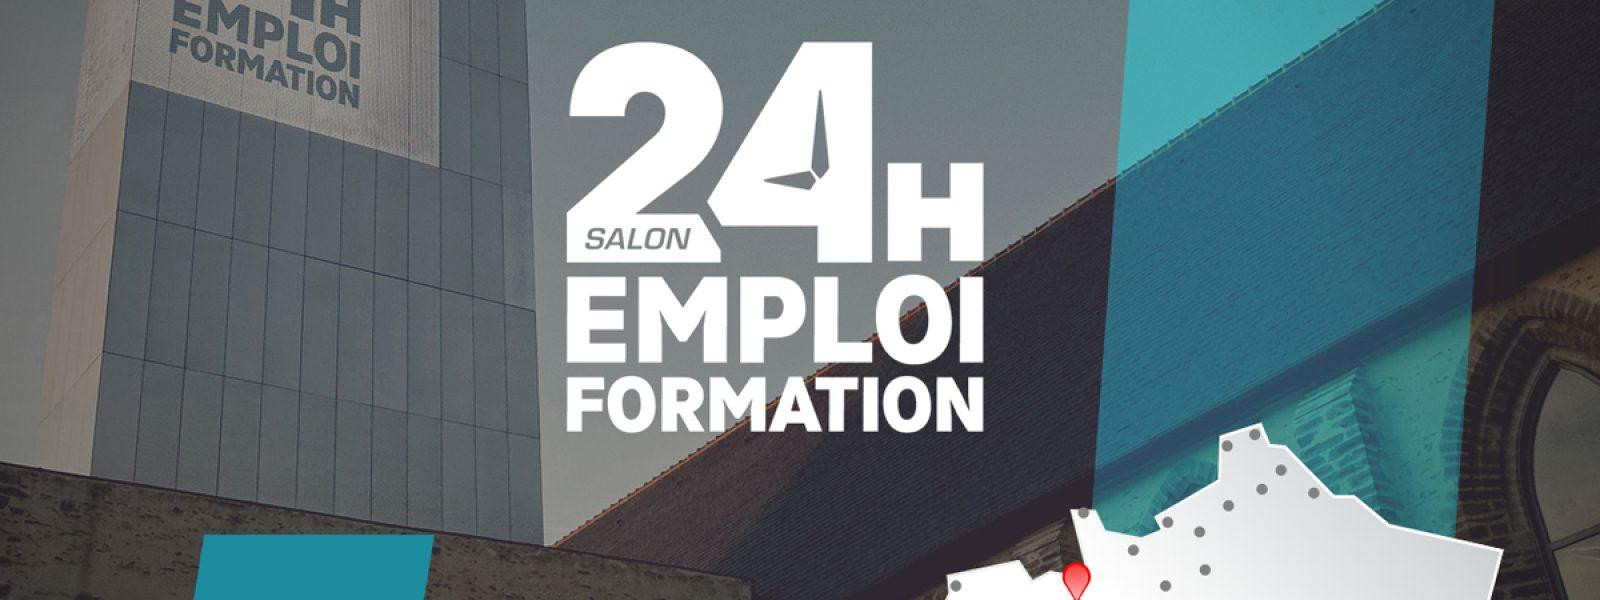 Salon 24h Emploi Formation Rennes 2020